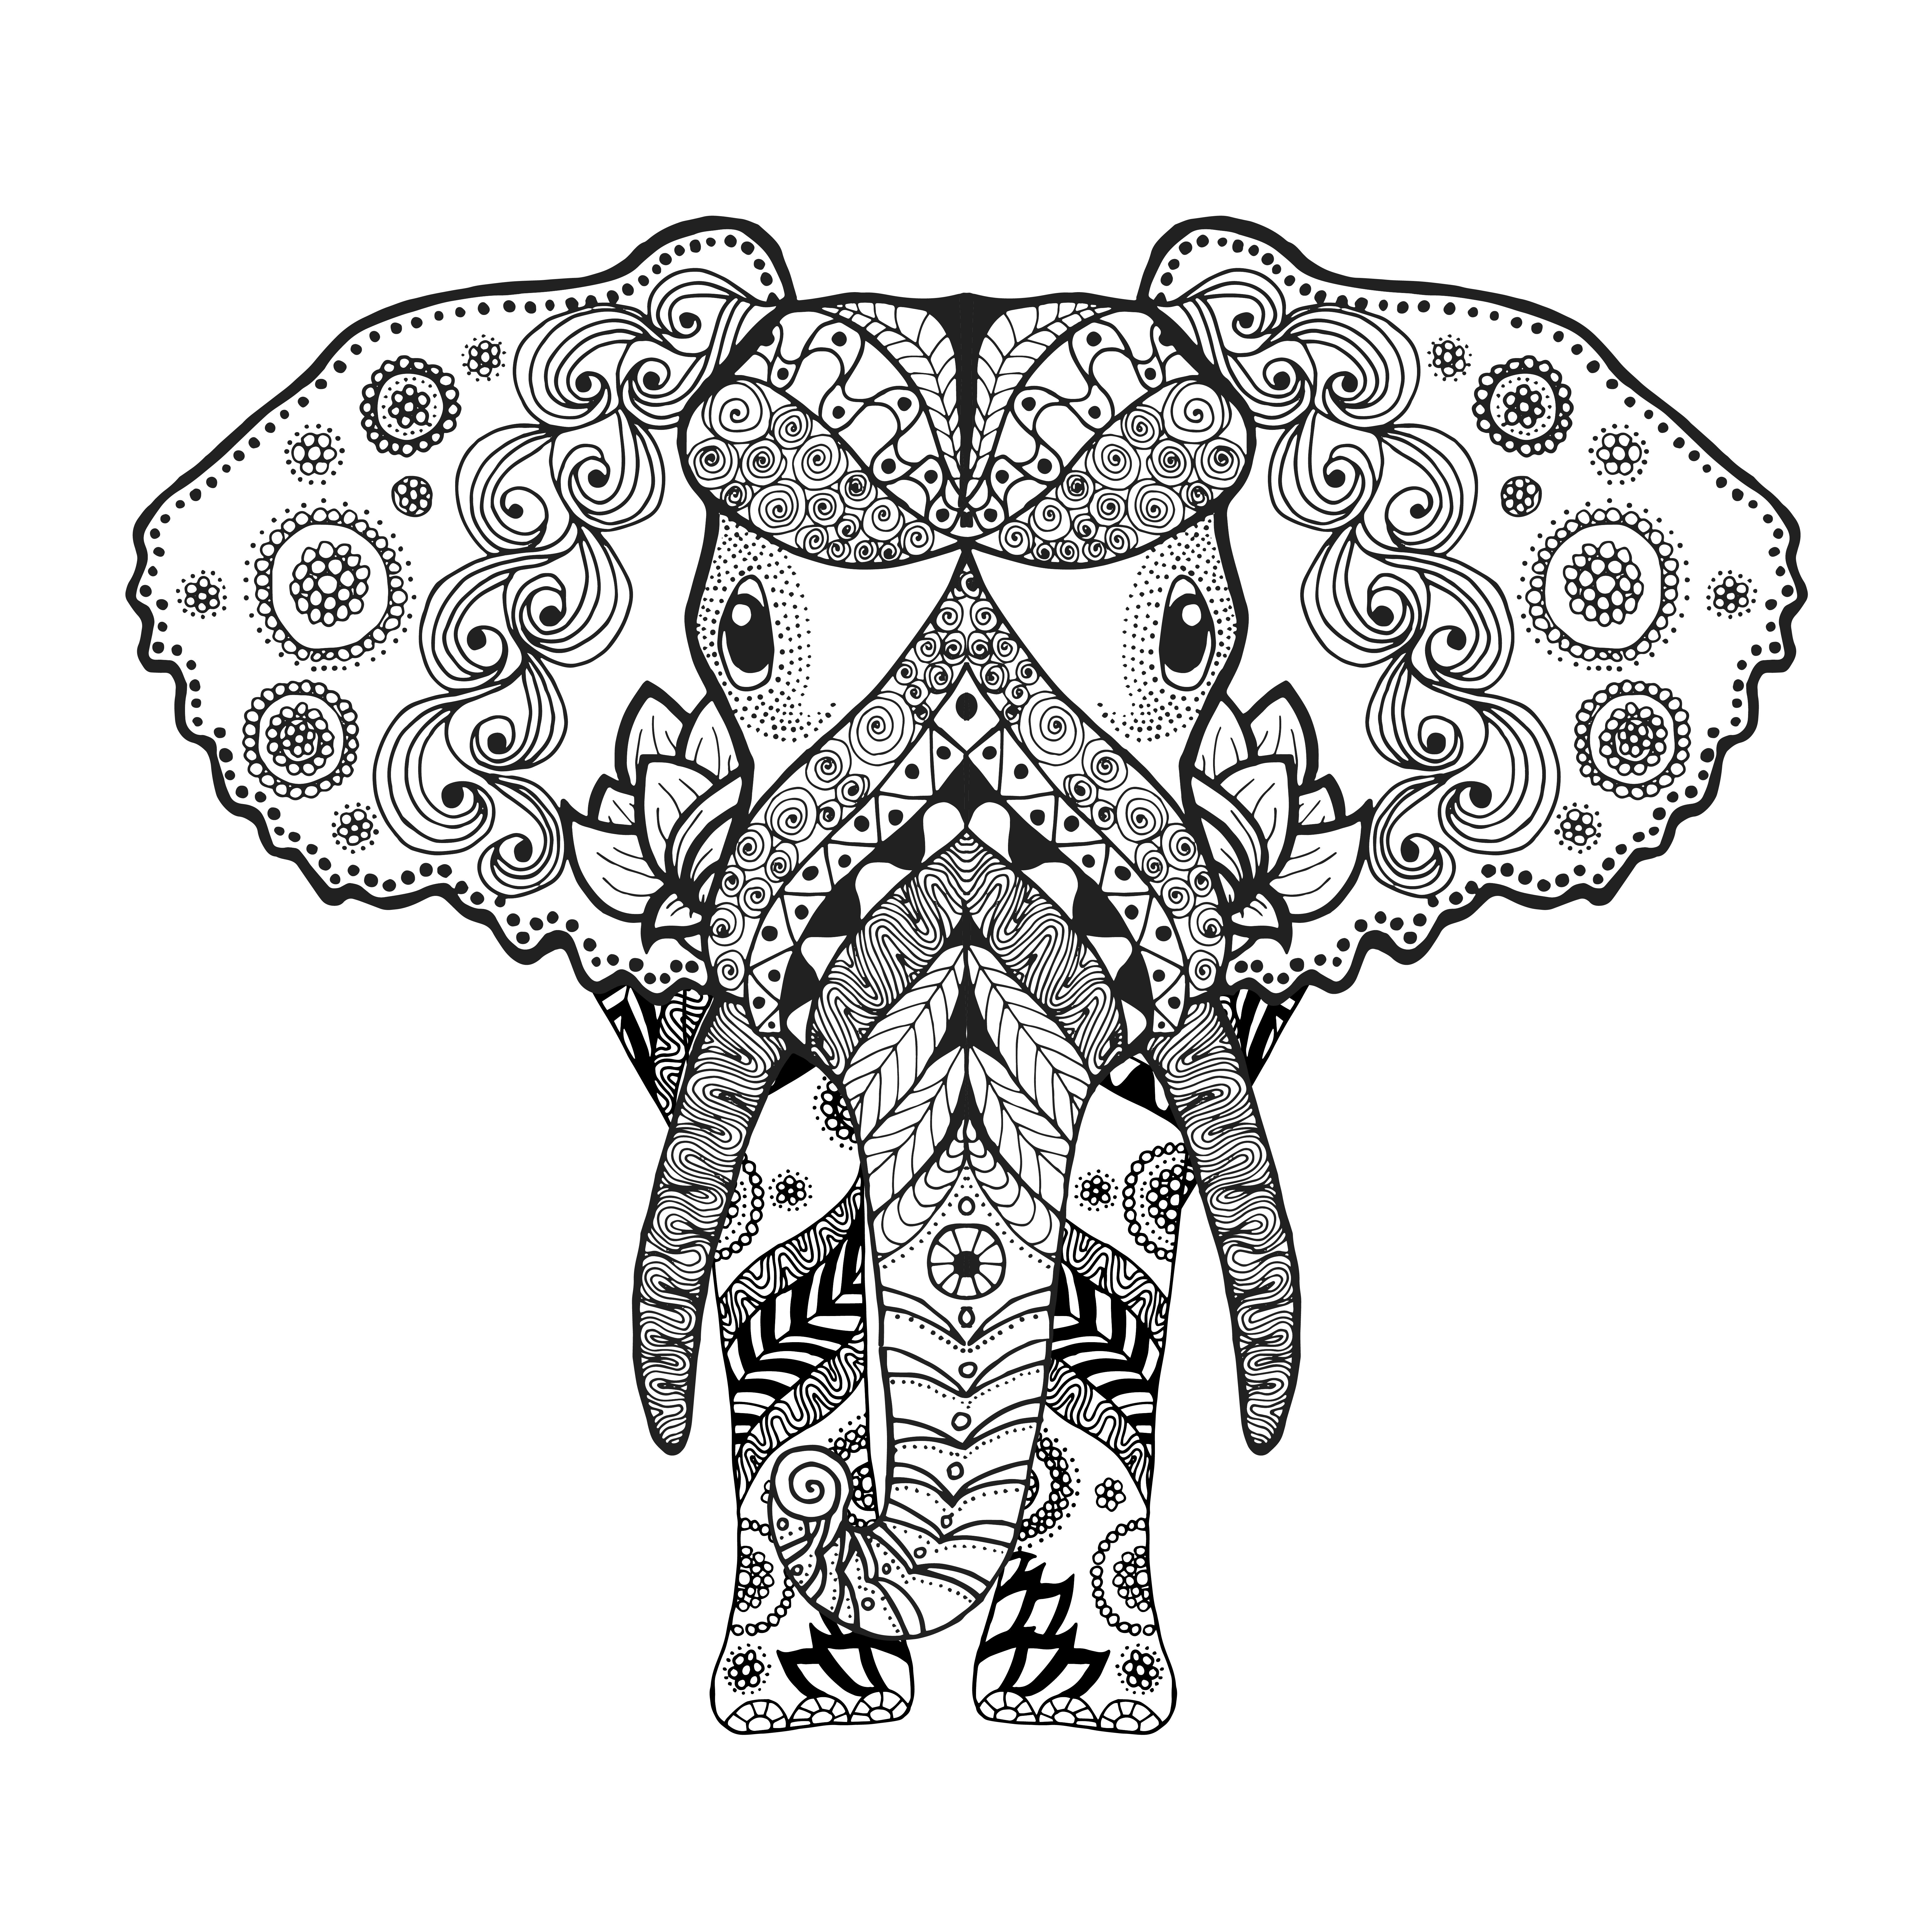 los mejores mandalas de elefantes debuda net. Black Bedroom Furniture Sets. Home Design Ideas